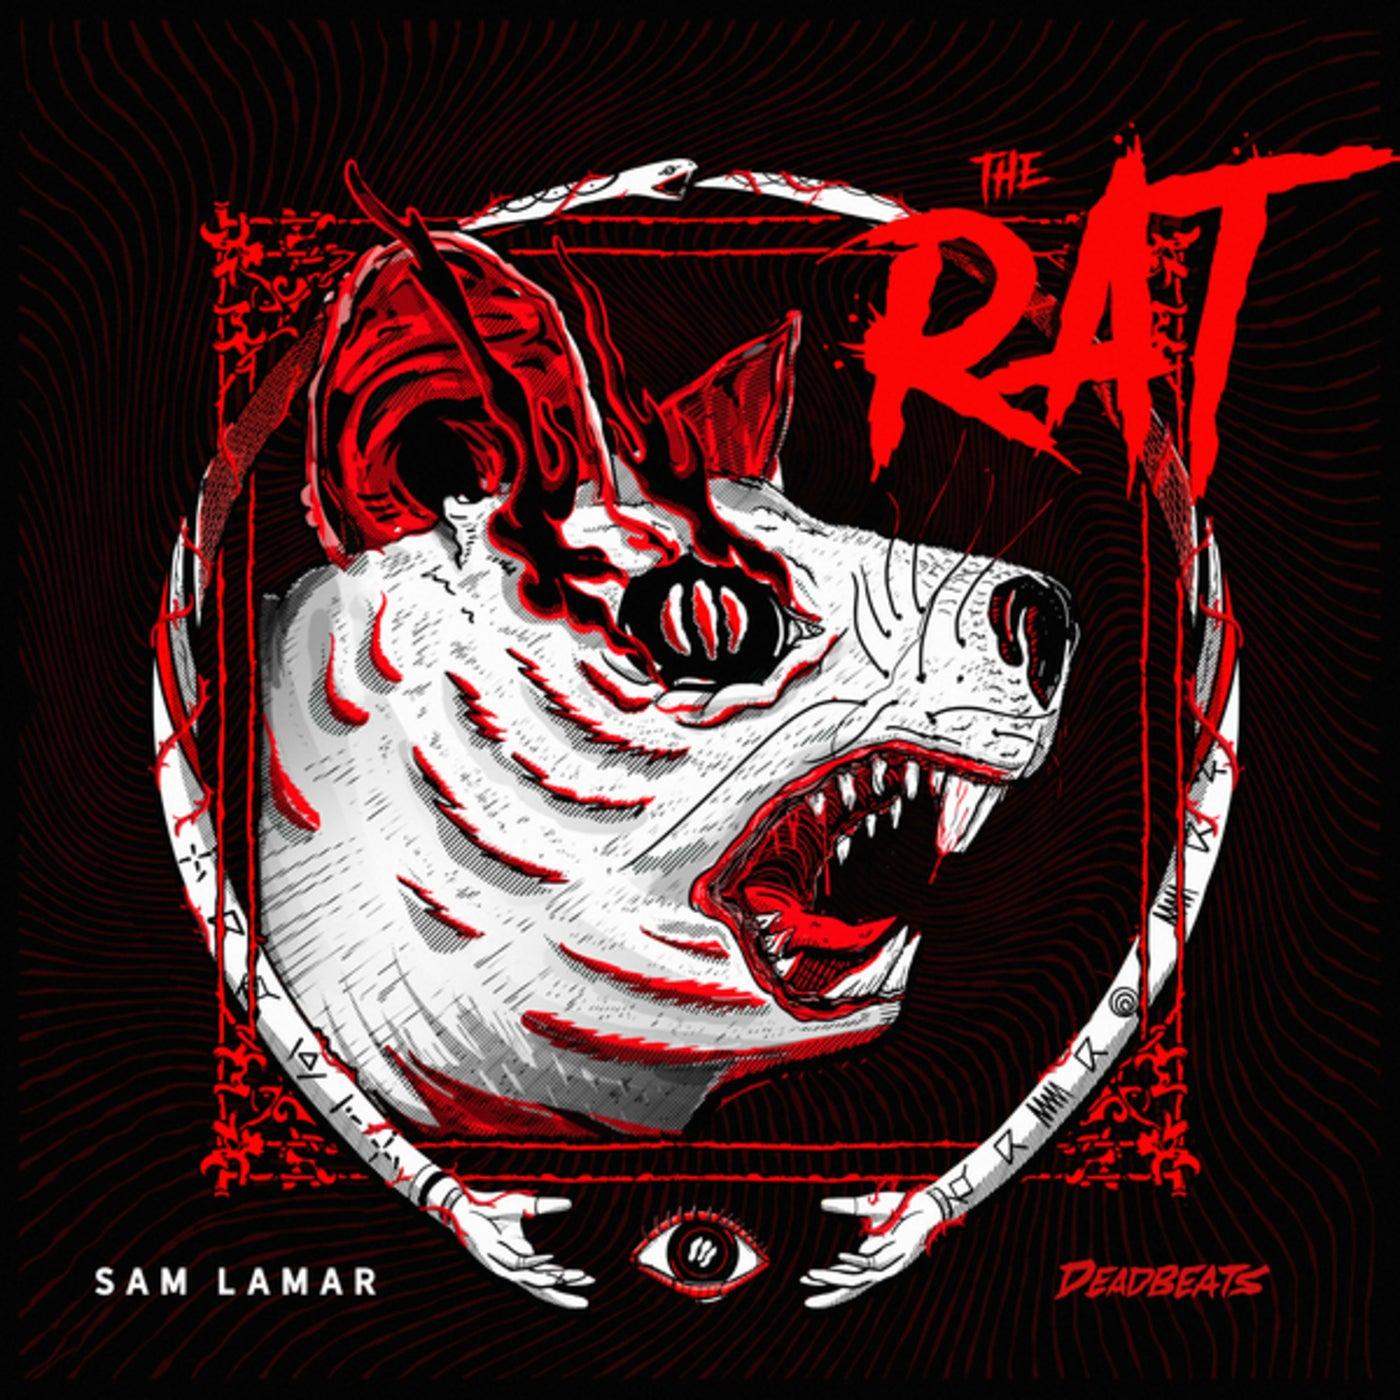 The Rat (Original Mix)